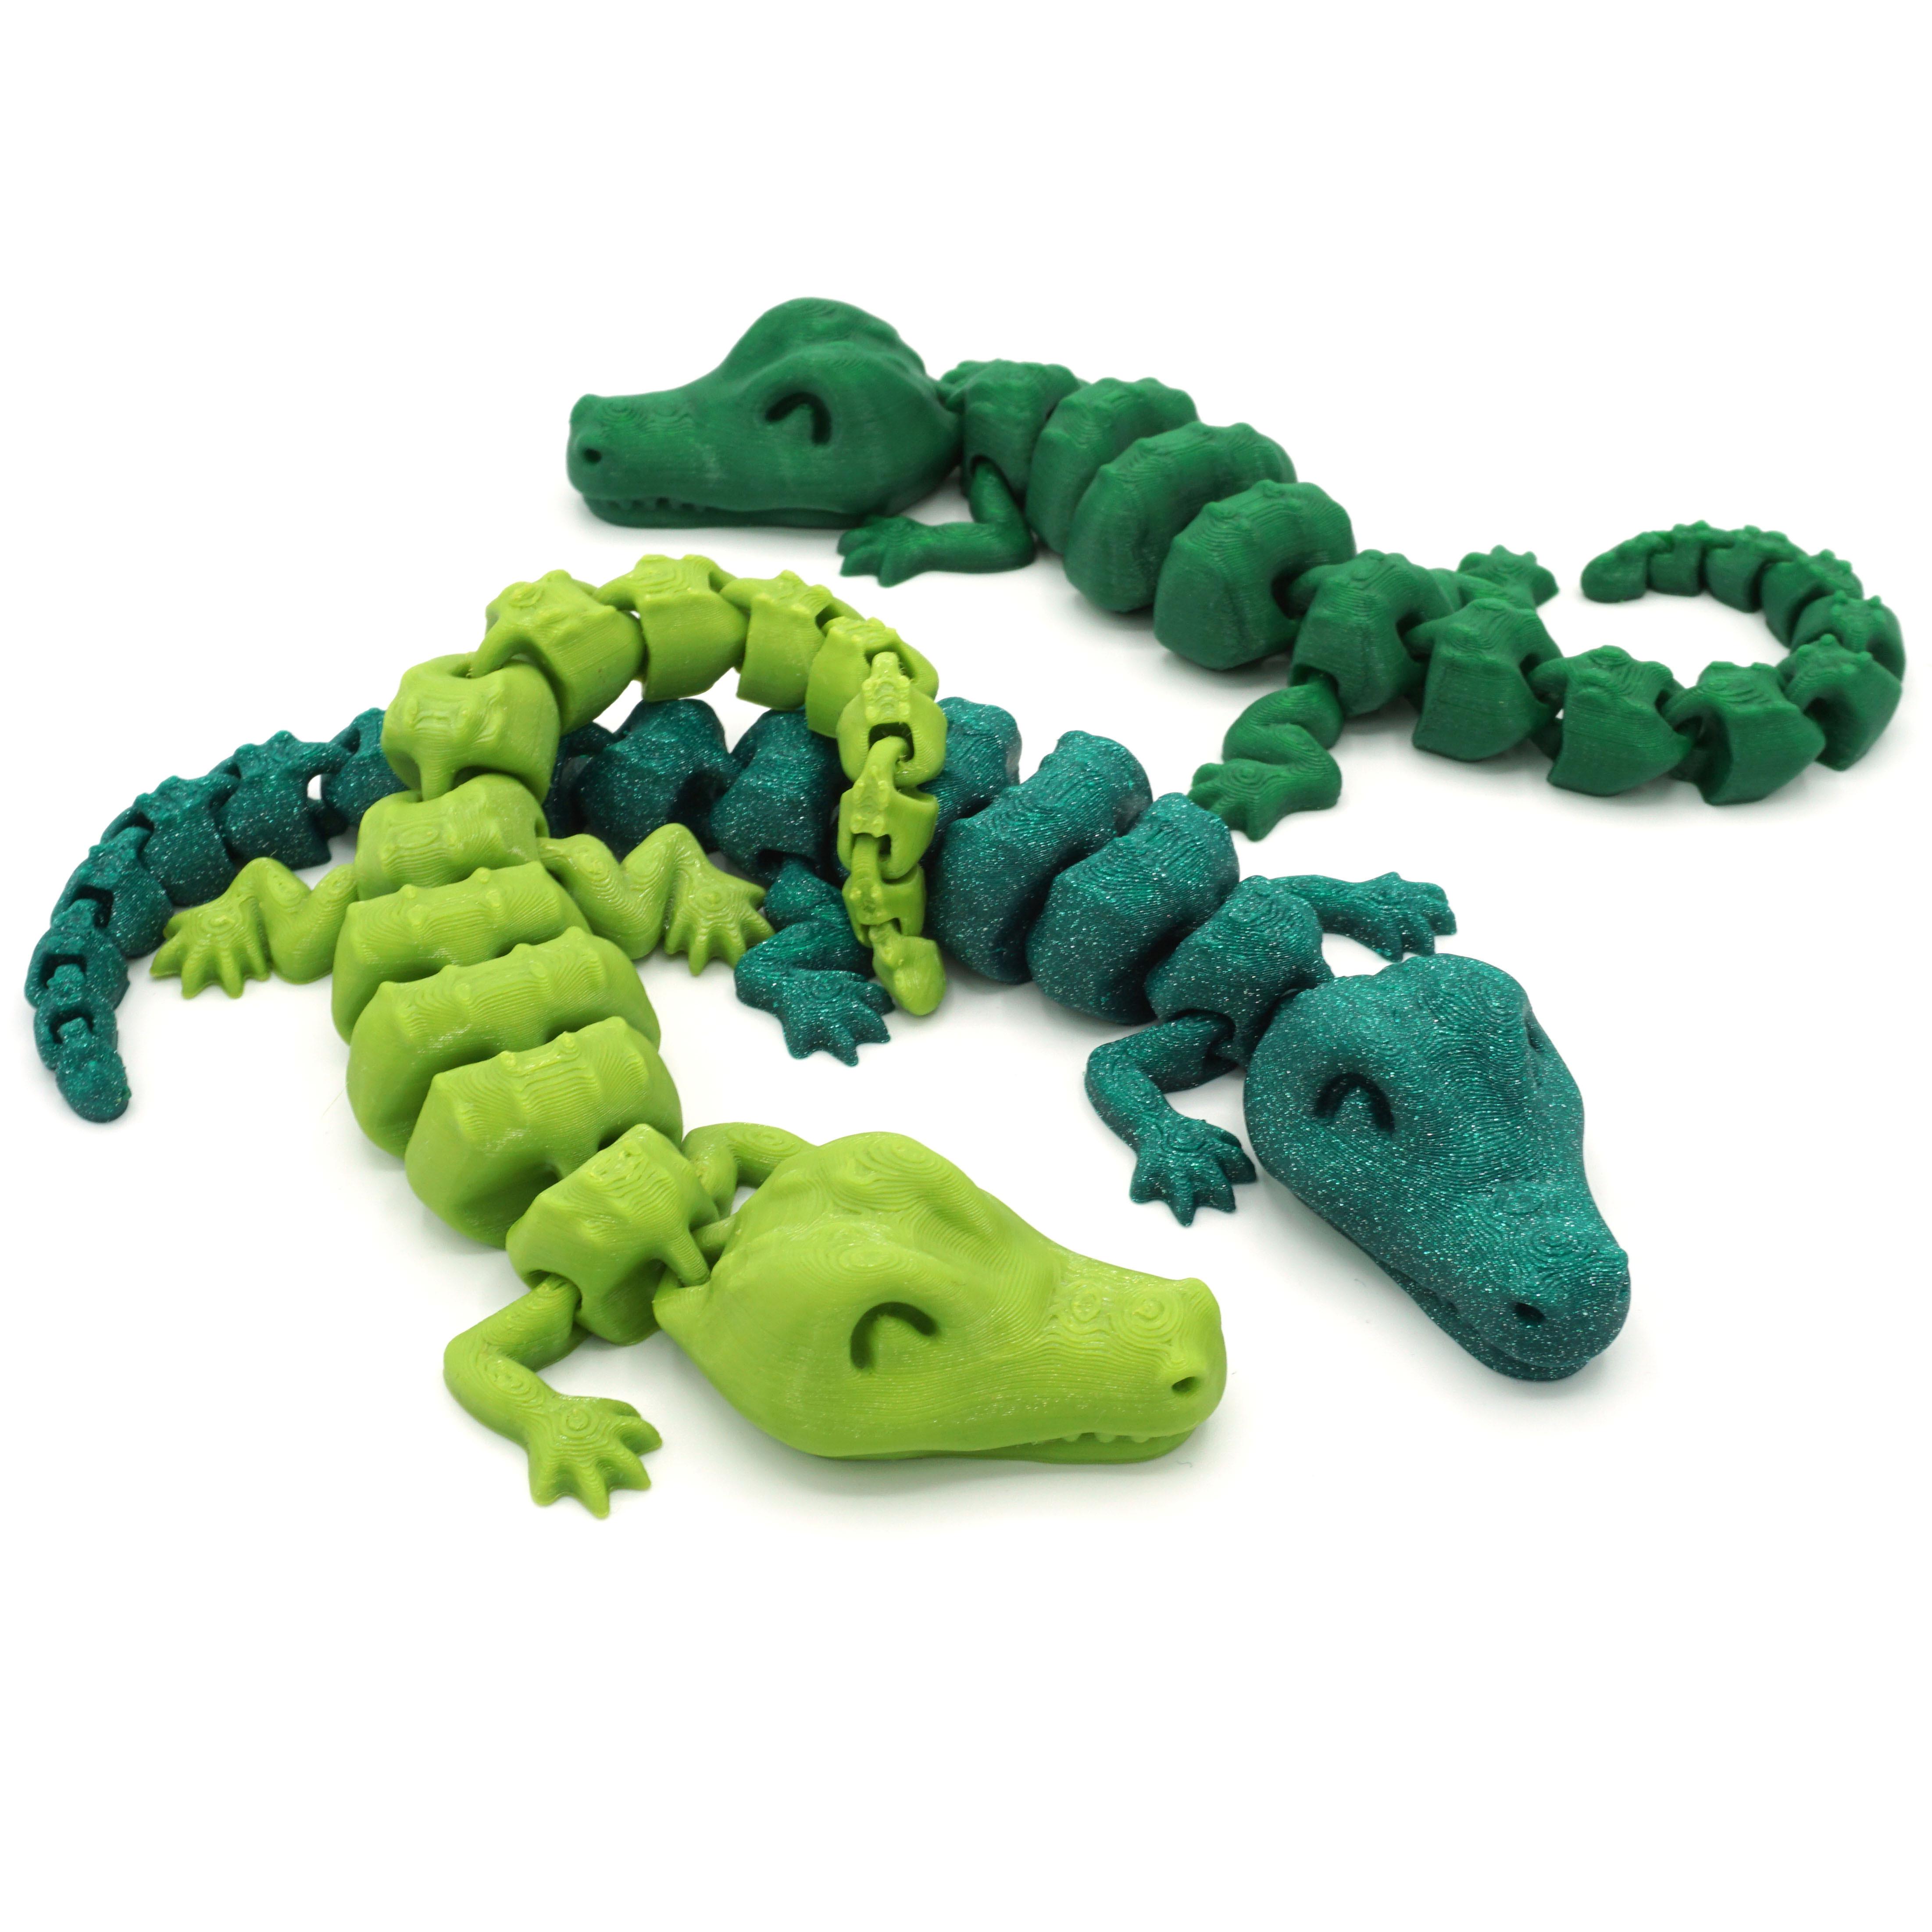 DSC01294 copia.jpg Download STL file Articulated Alligator • 3D printing object, mcgybeer